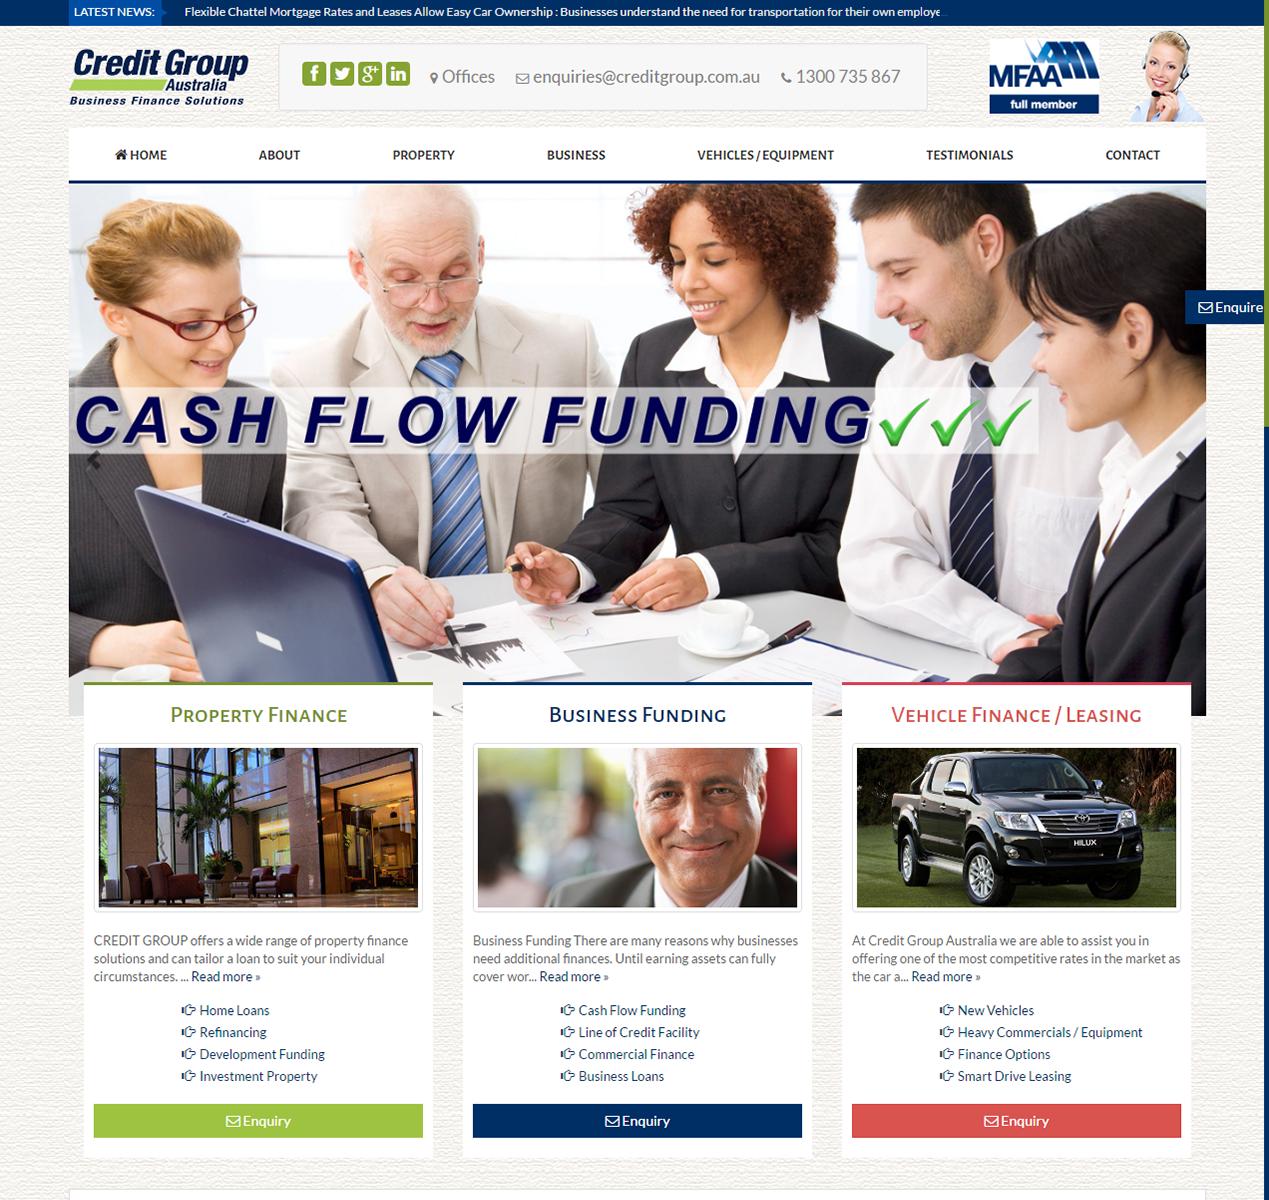 Credit Group